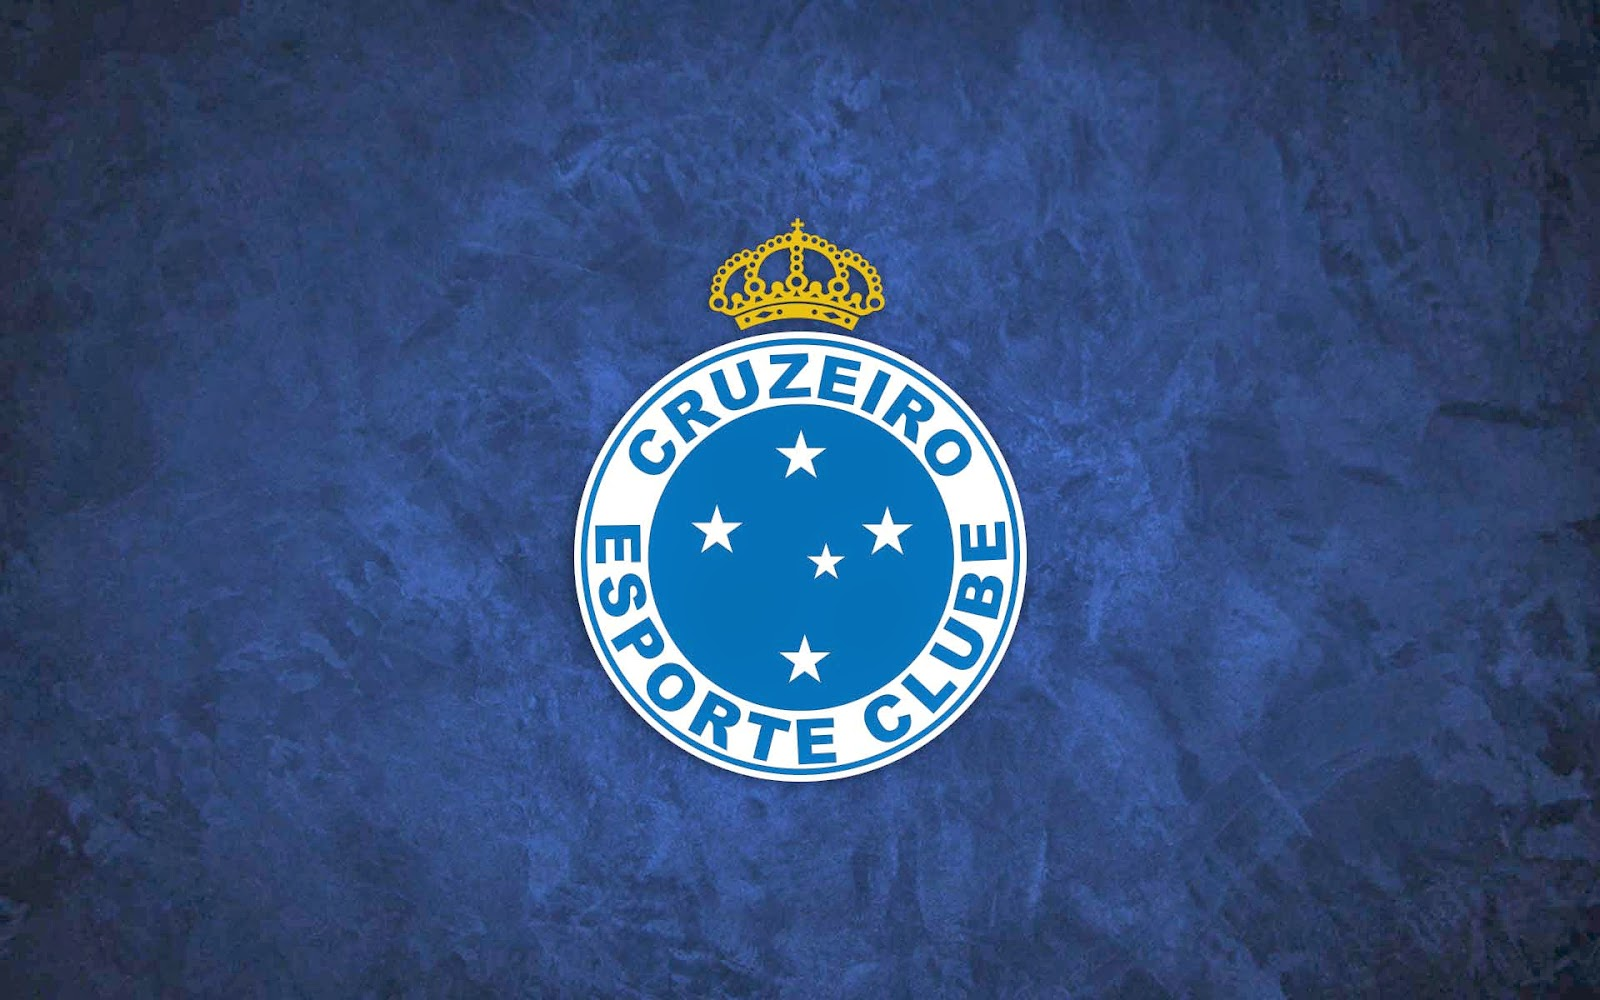 Logo oficial do Cruzeiro Esporte Clube